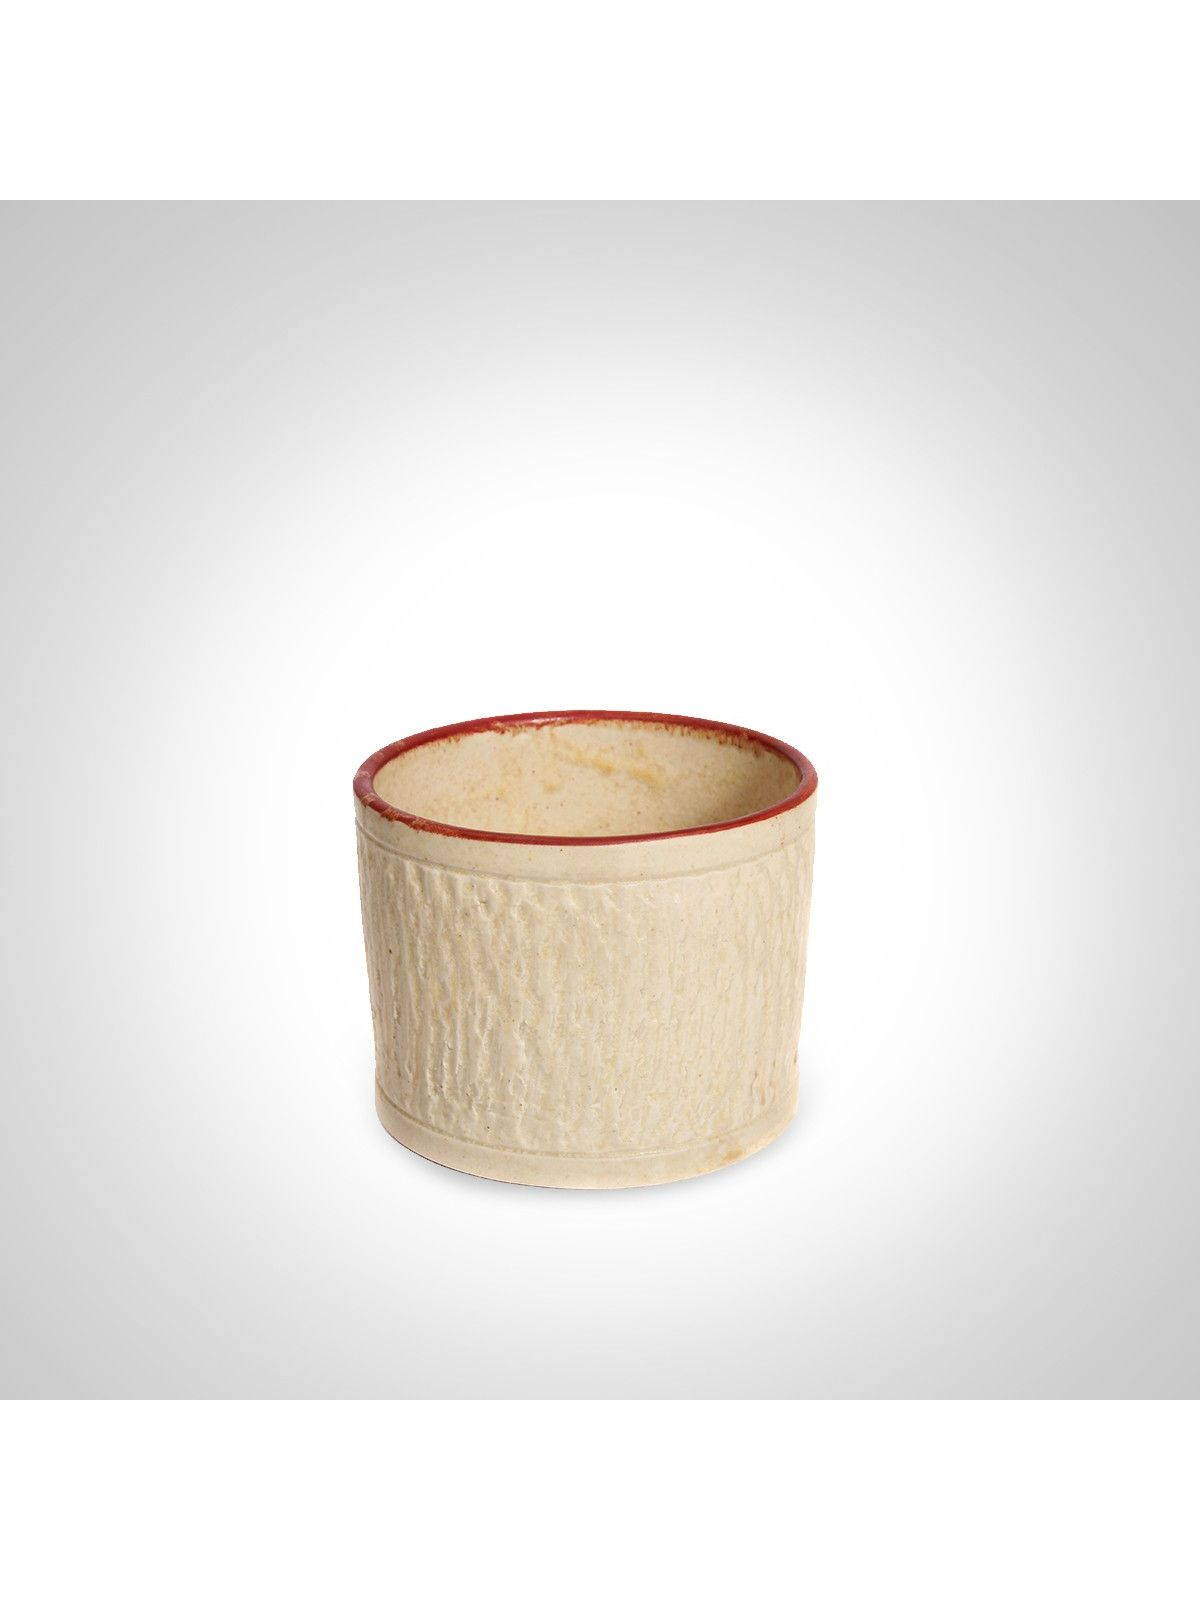 White ashen ceramic keeper